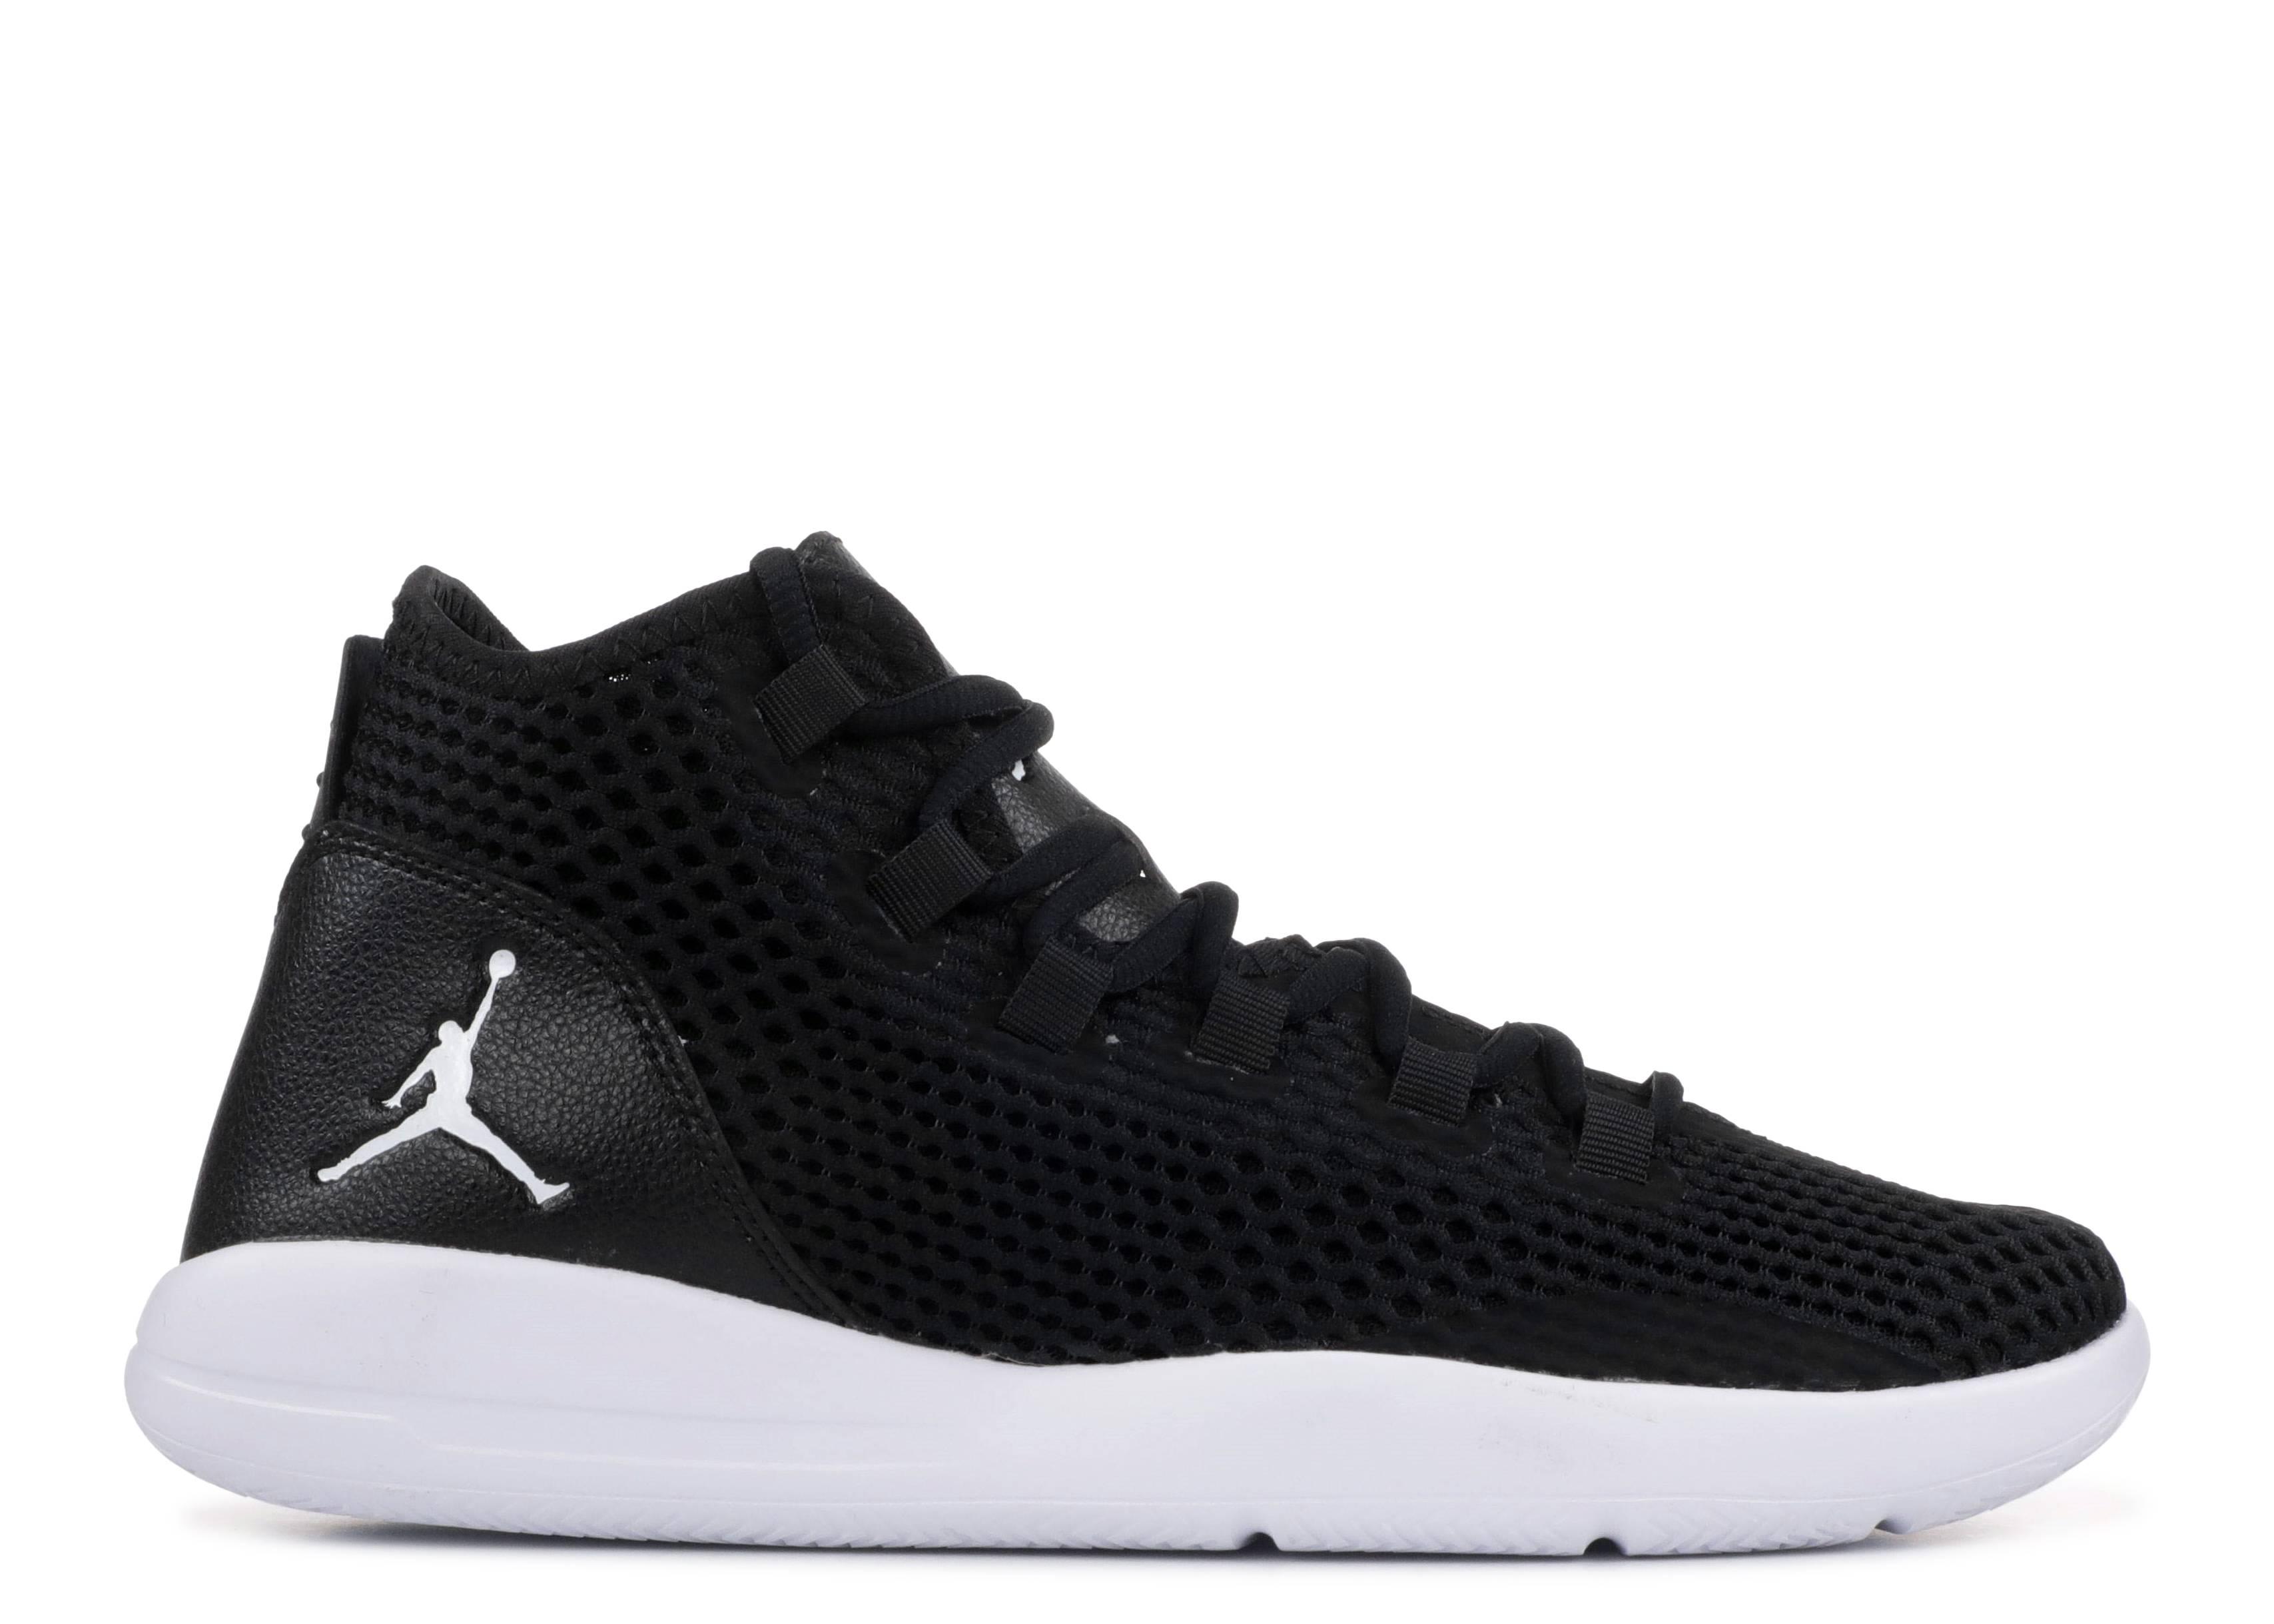 huge discount 174fe bd02a Jordan Reveal - Air Jordan - 834064 010 - black white-black-white ...